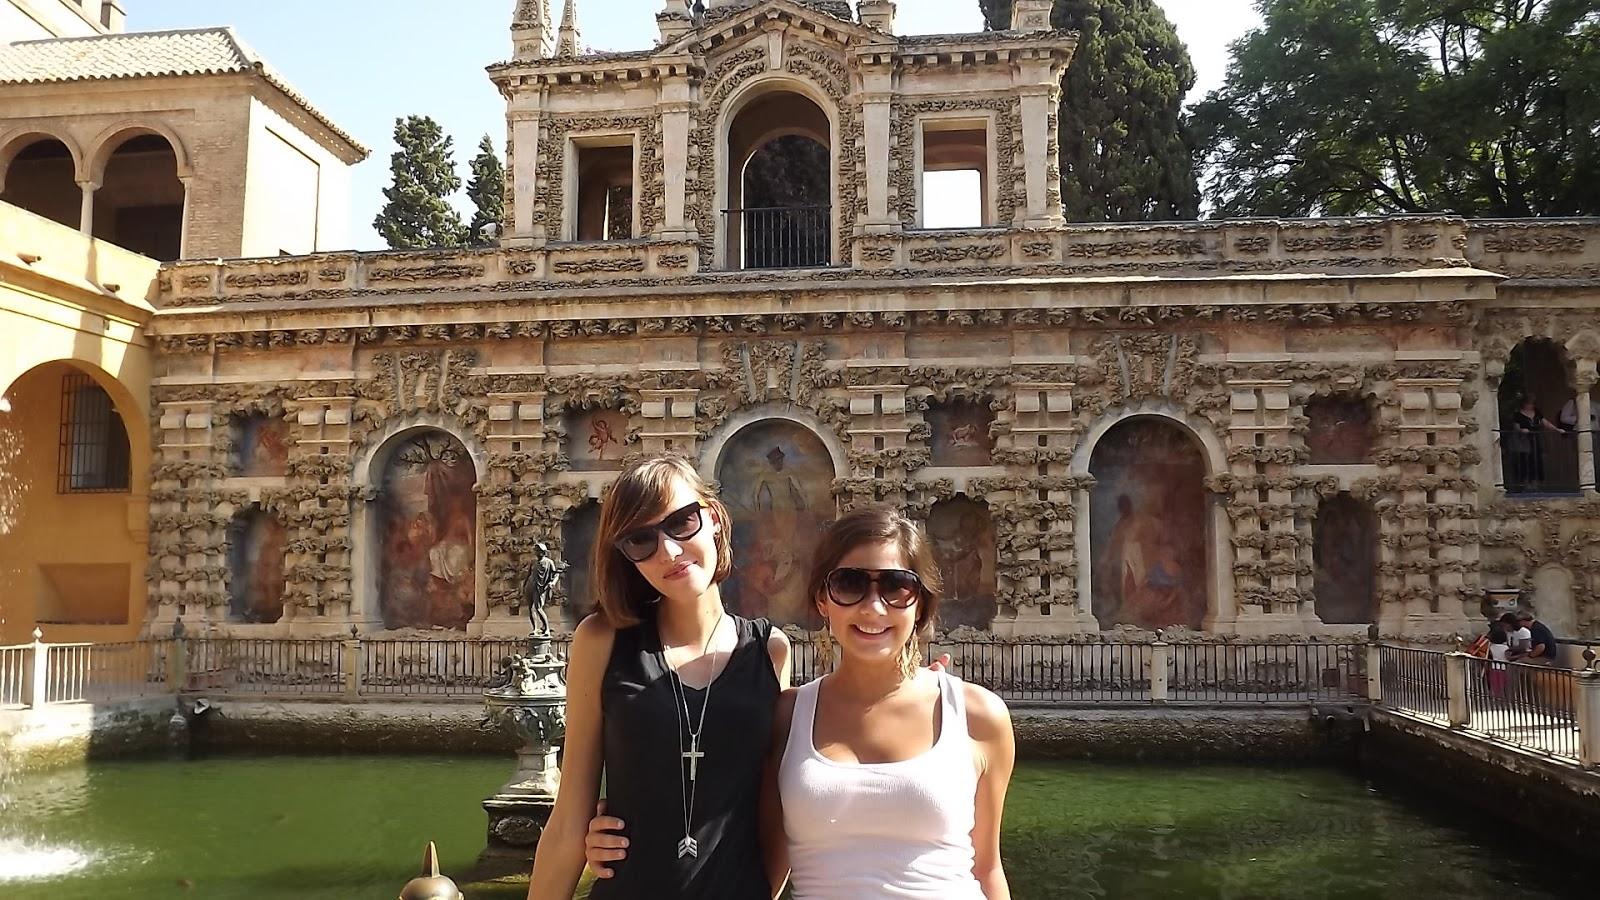 Just Blogging University Of Seville Orientation And Visit